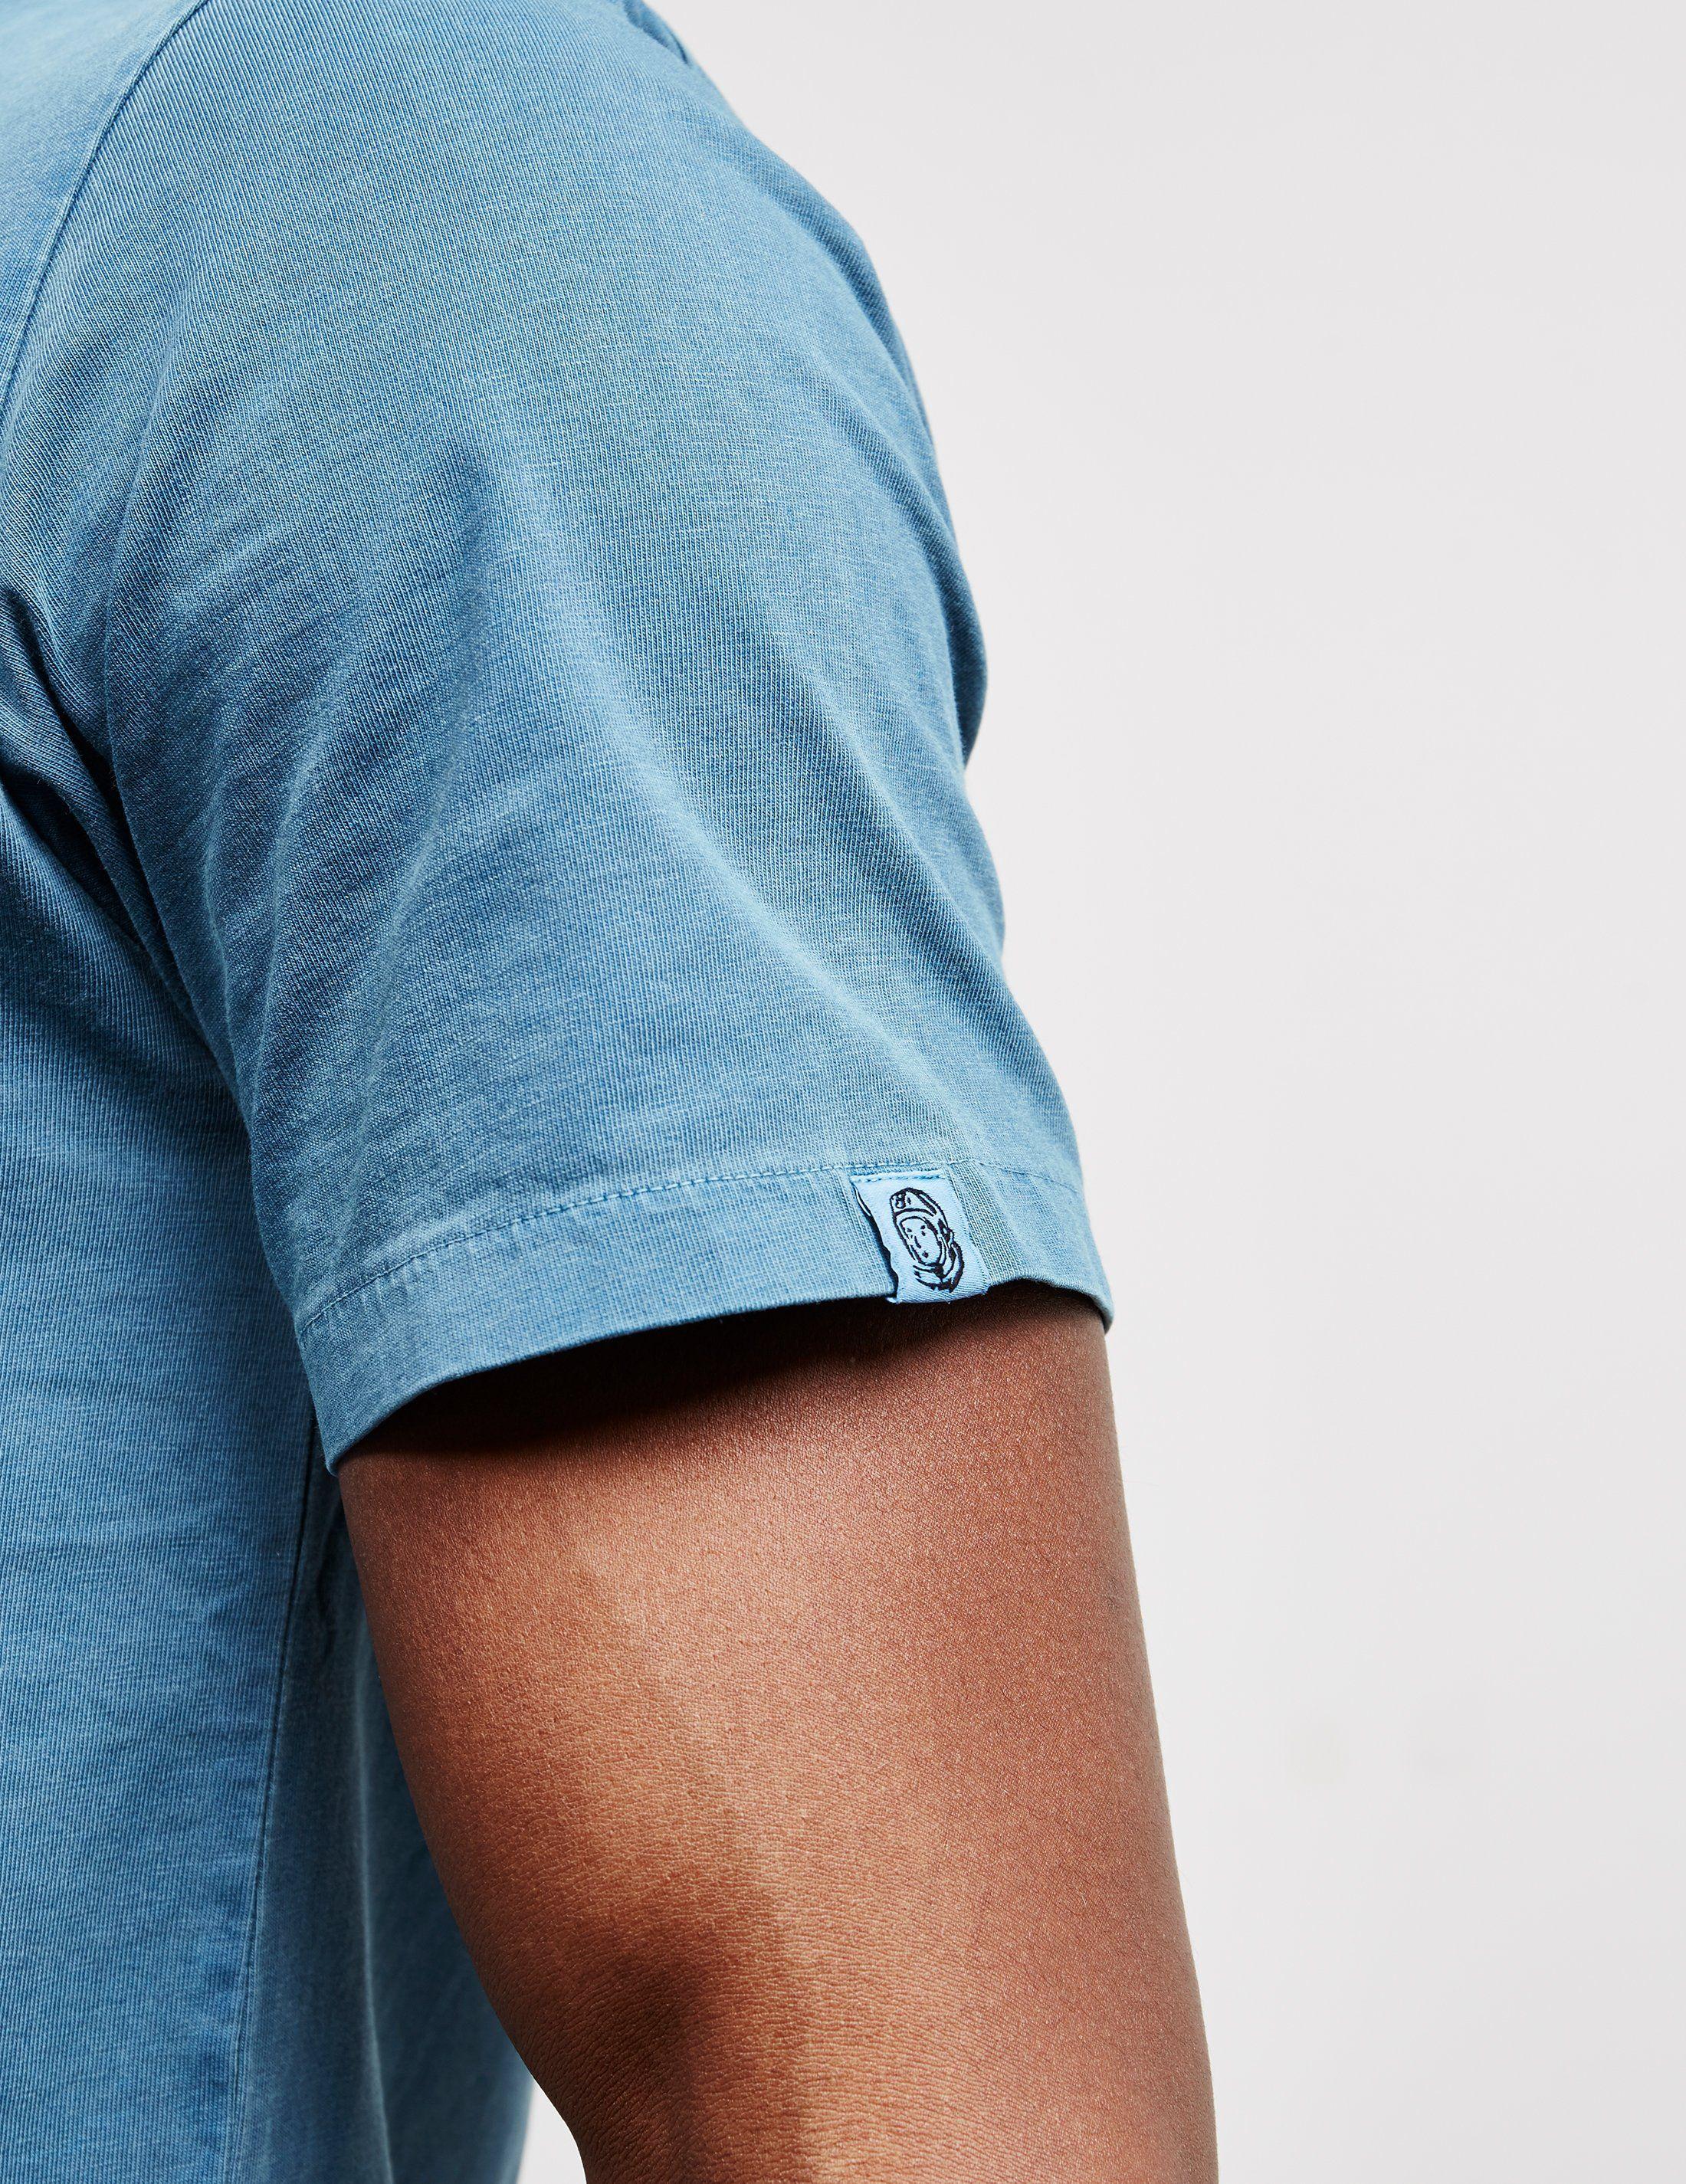 Billionaire Boys Club Overdye Short Sleeve Logo T-Shirt